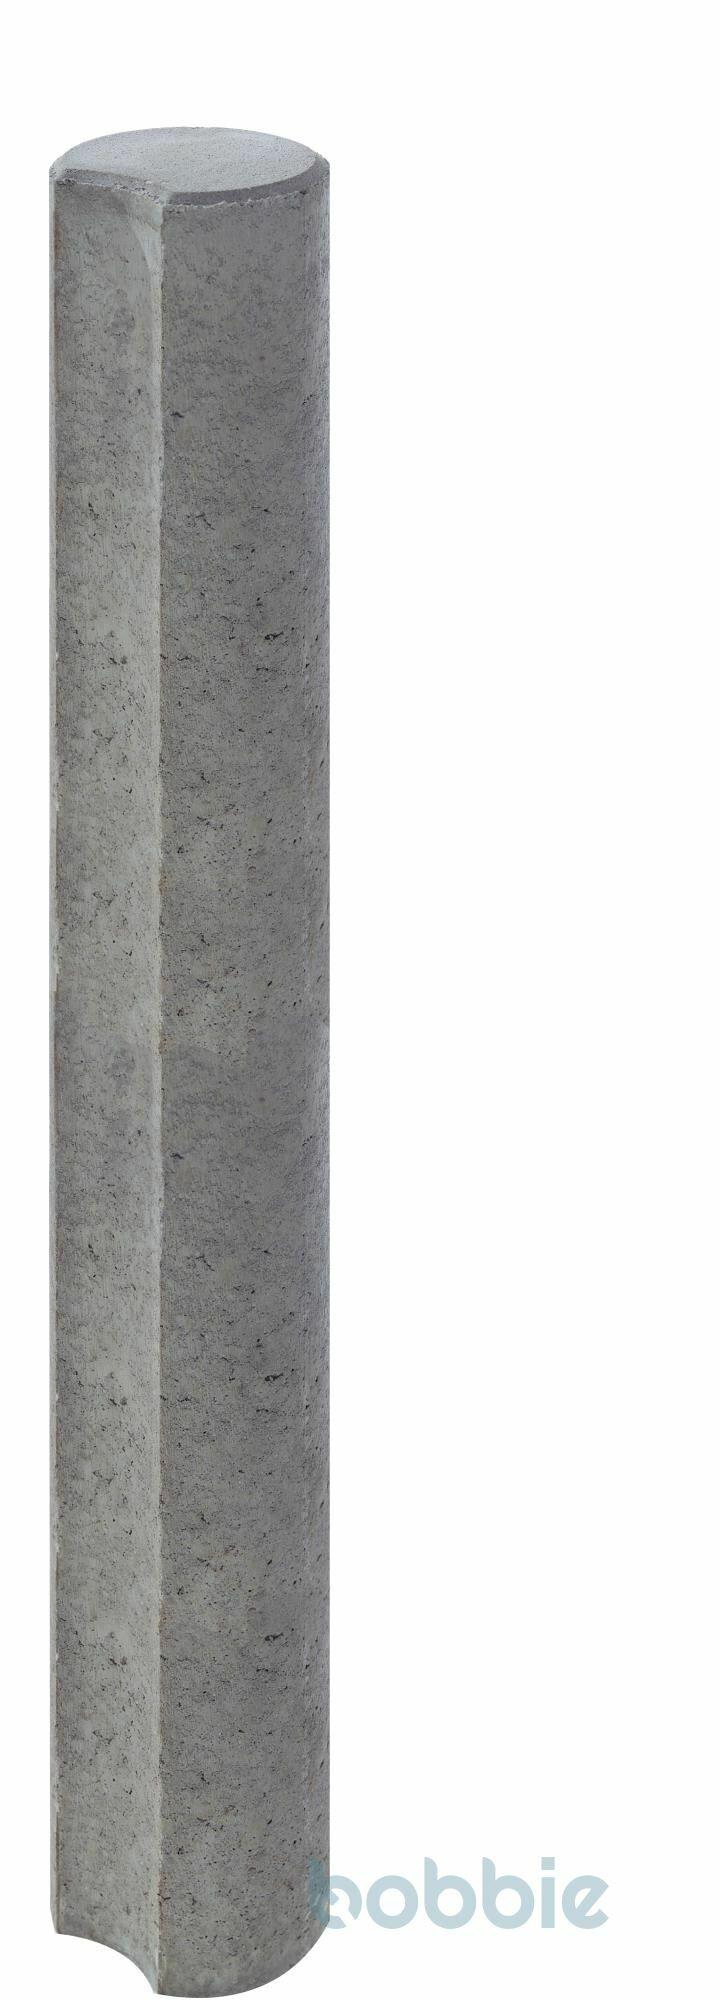 DIEPHAUS VERBUNDPALISADE GRAU 150/20 CM